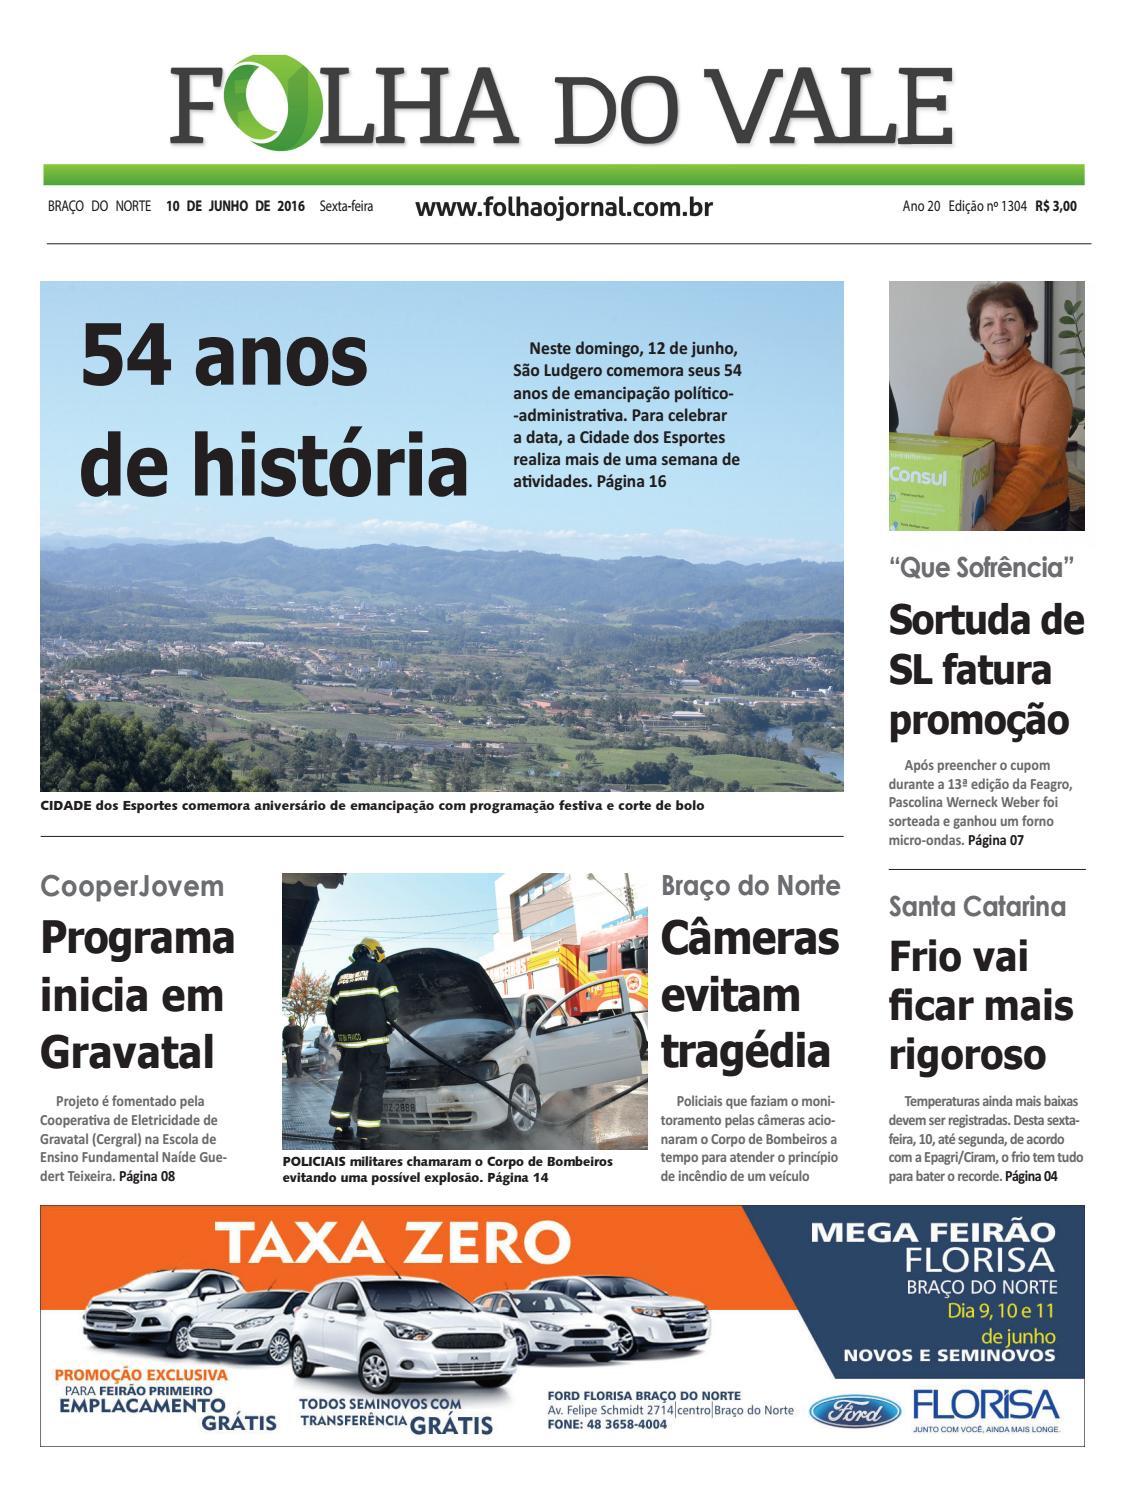 2sd1as25da5s2d4a5sd4a6sd4as5d4 by Folha do Vale - issuu c39b2fd335